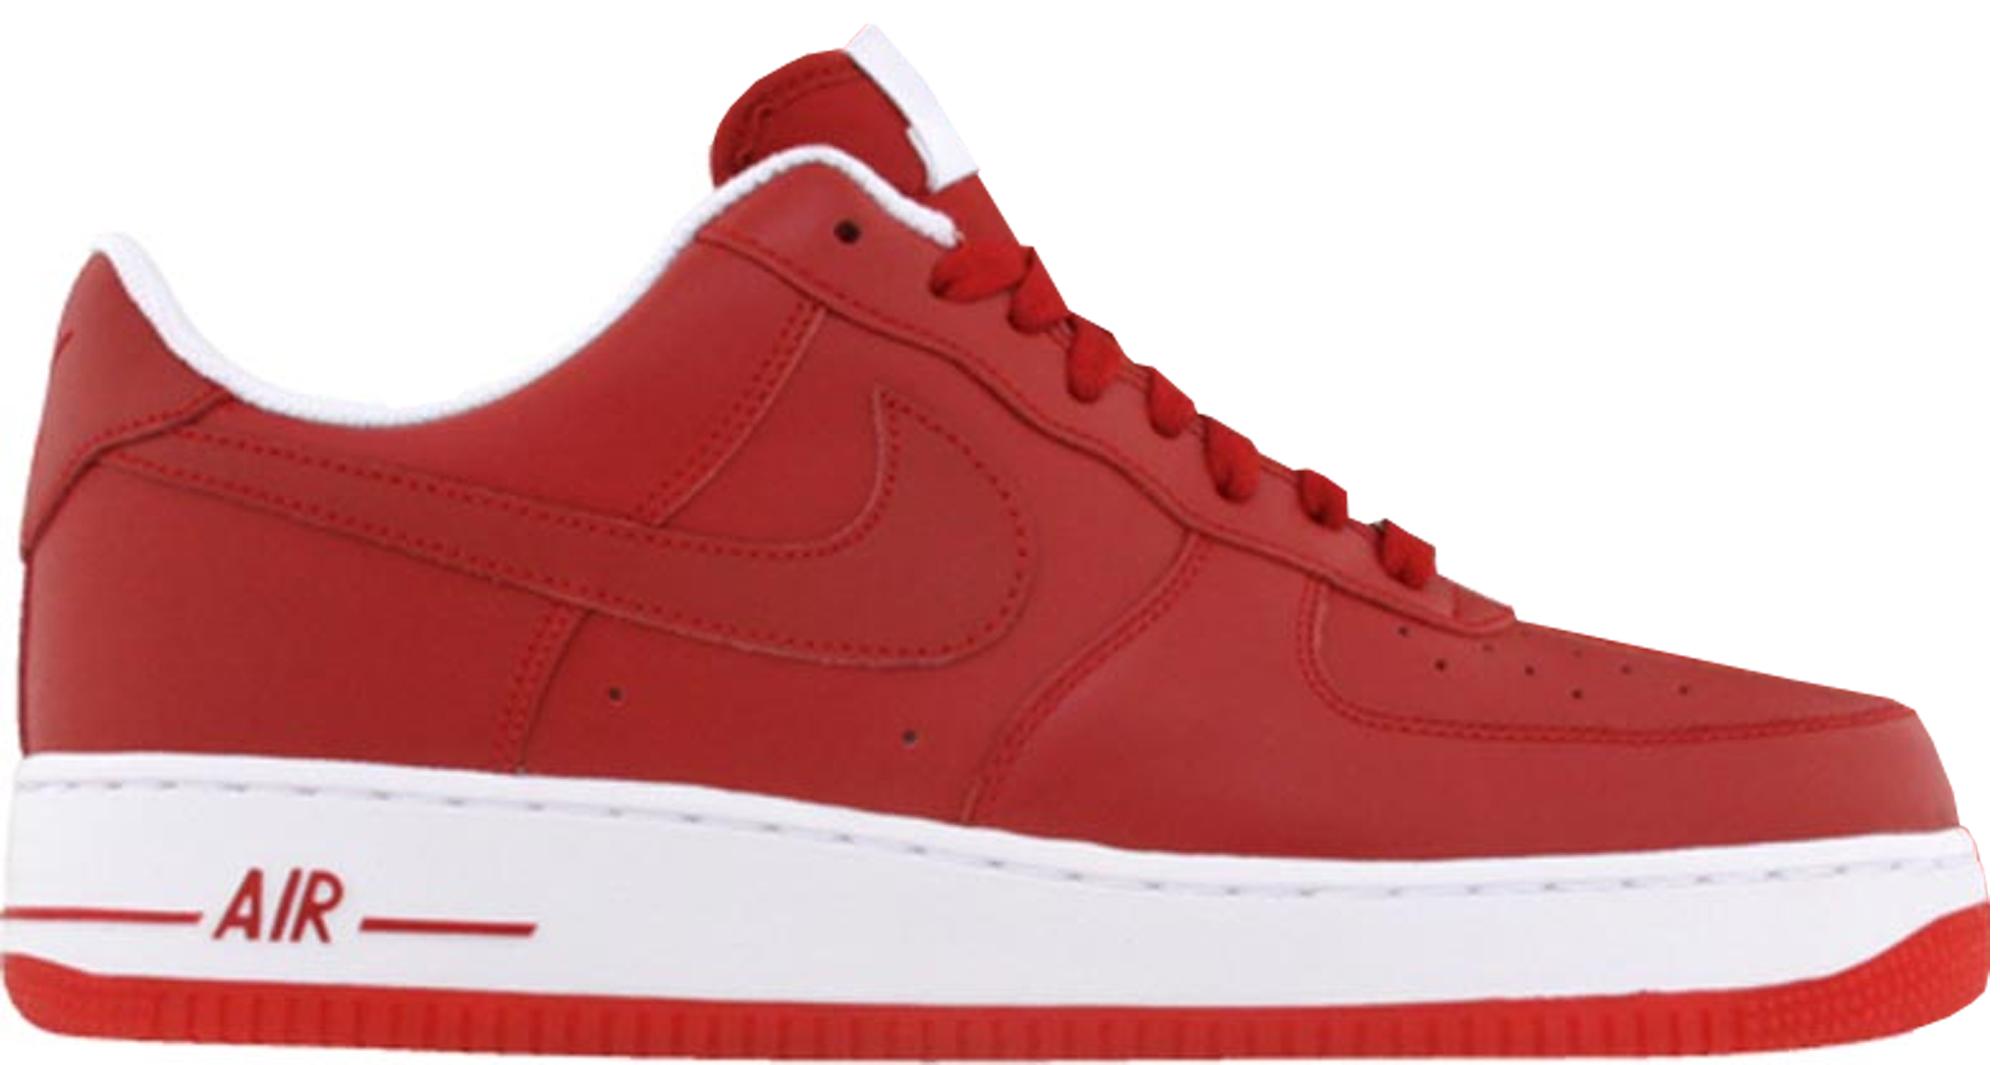 Nike Air Force 1 Low Varsity Red (2010